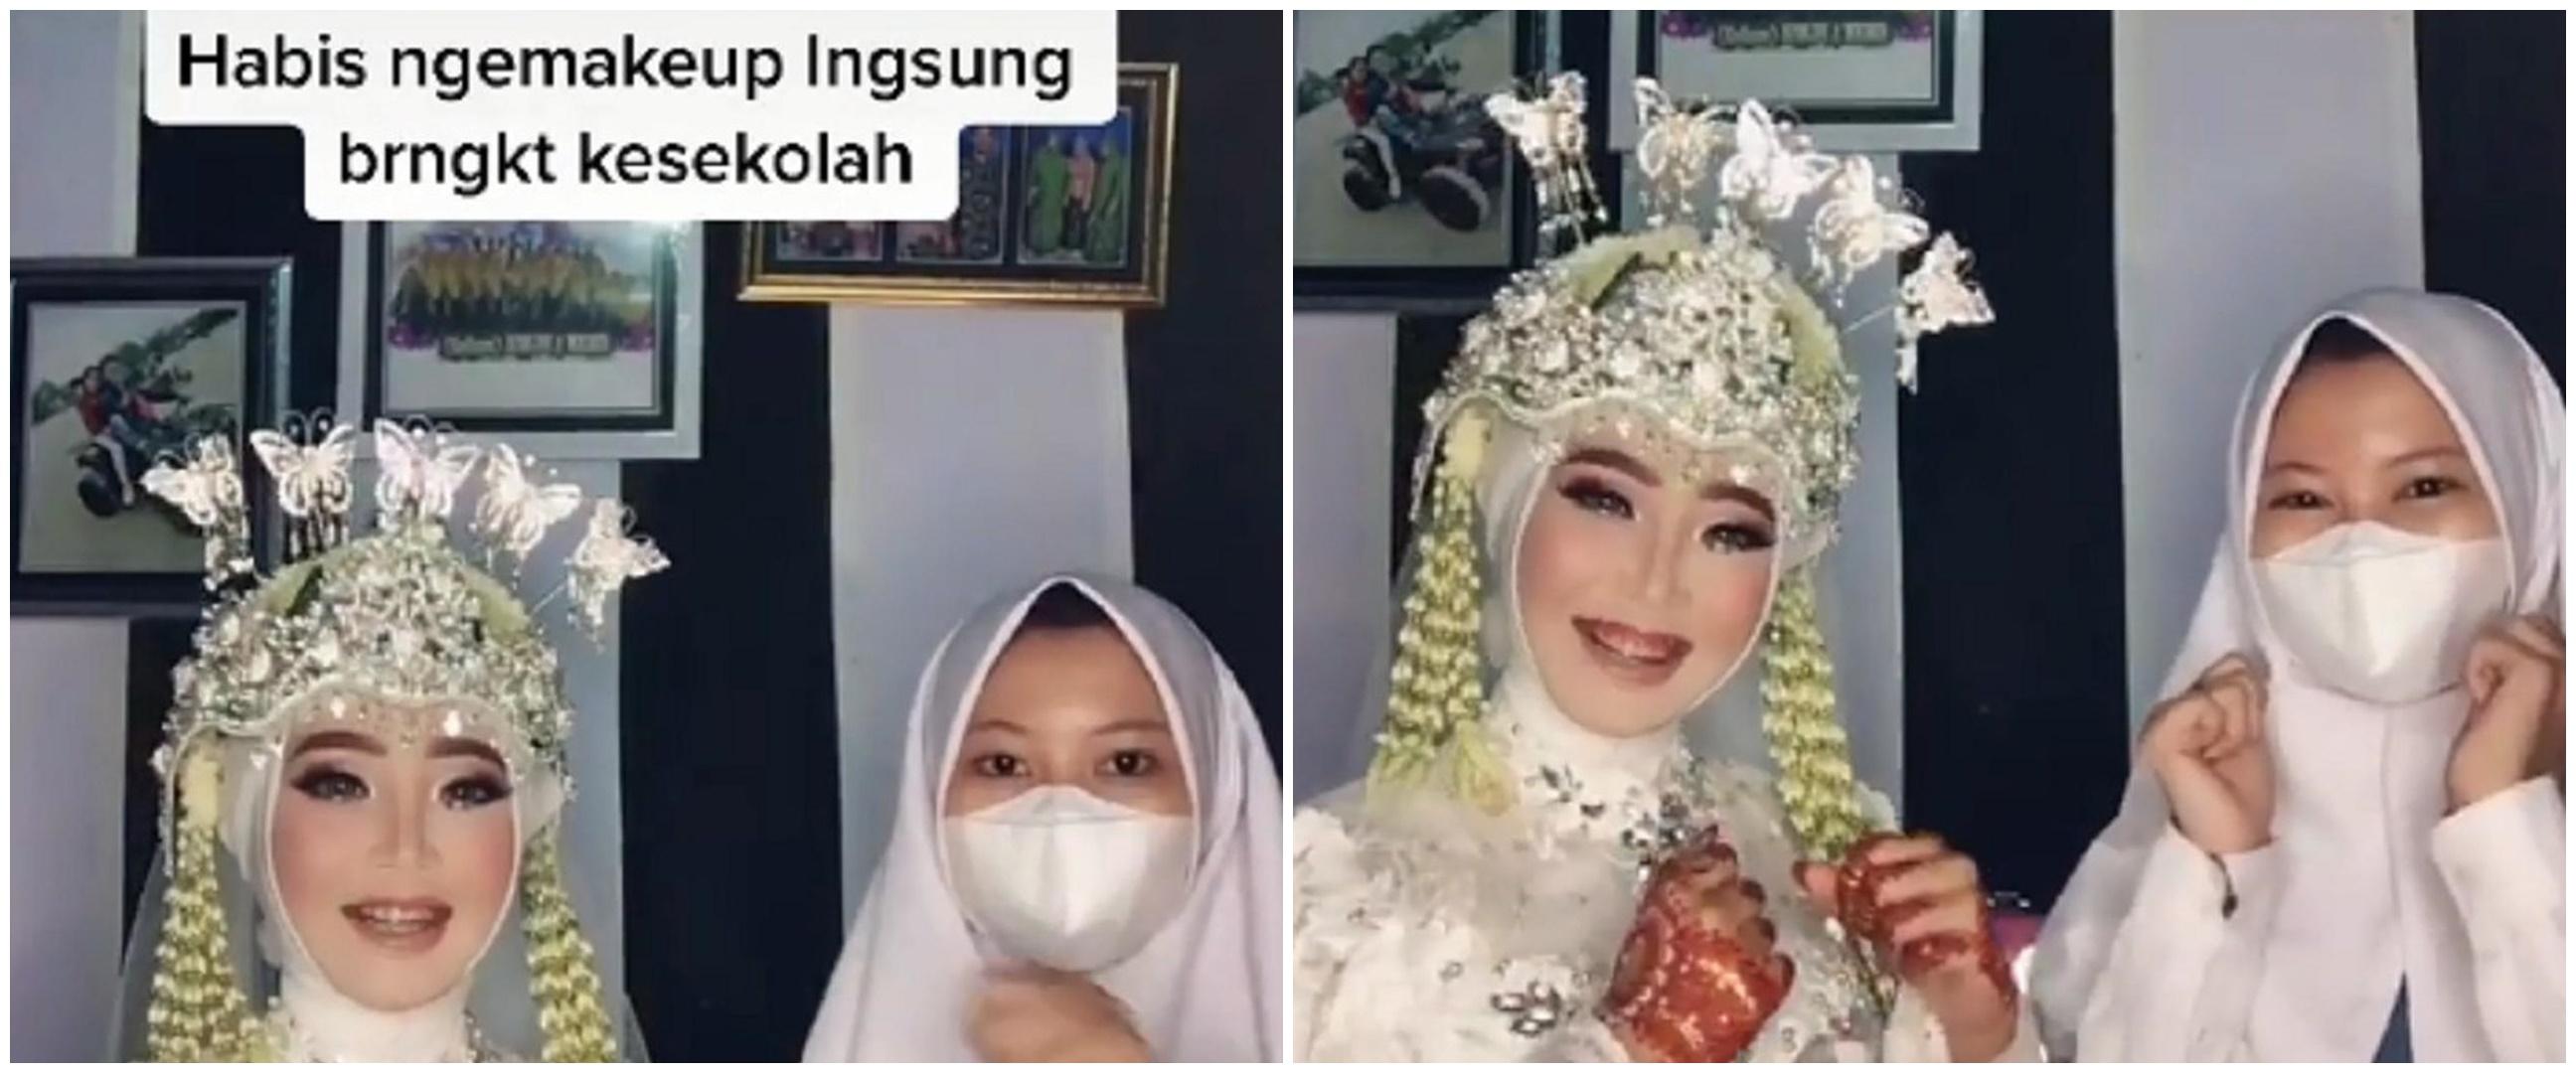 Kisah gadis SMA jadi MUA wedding, kerja pakai seragam usai sekolah